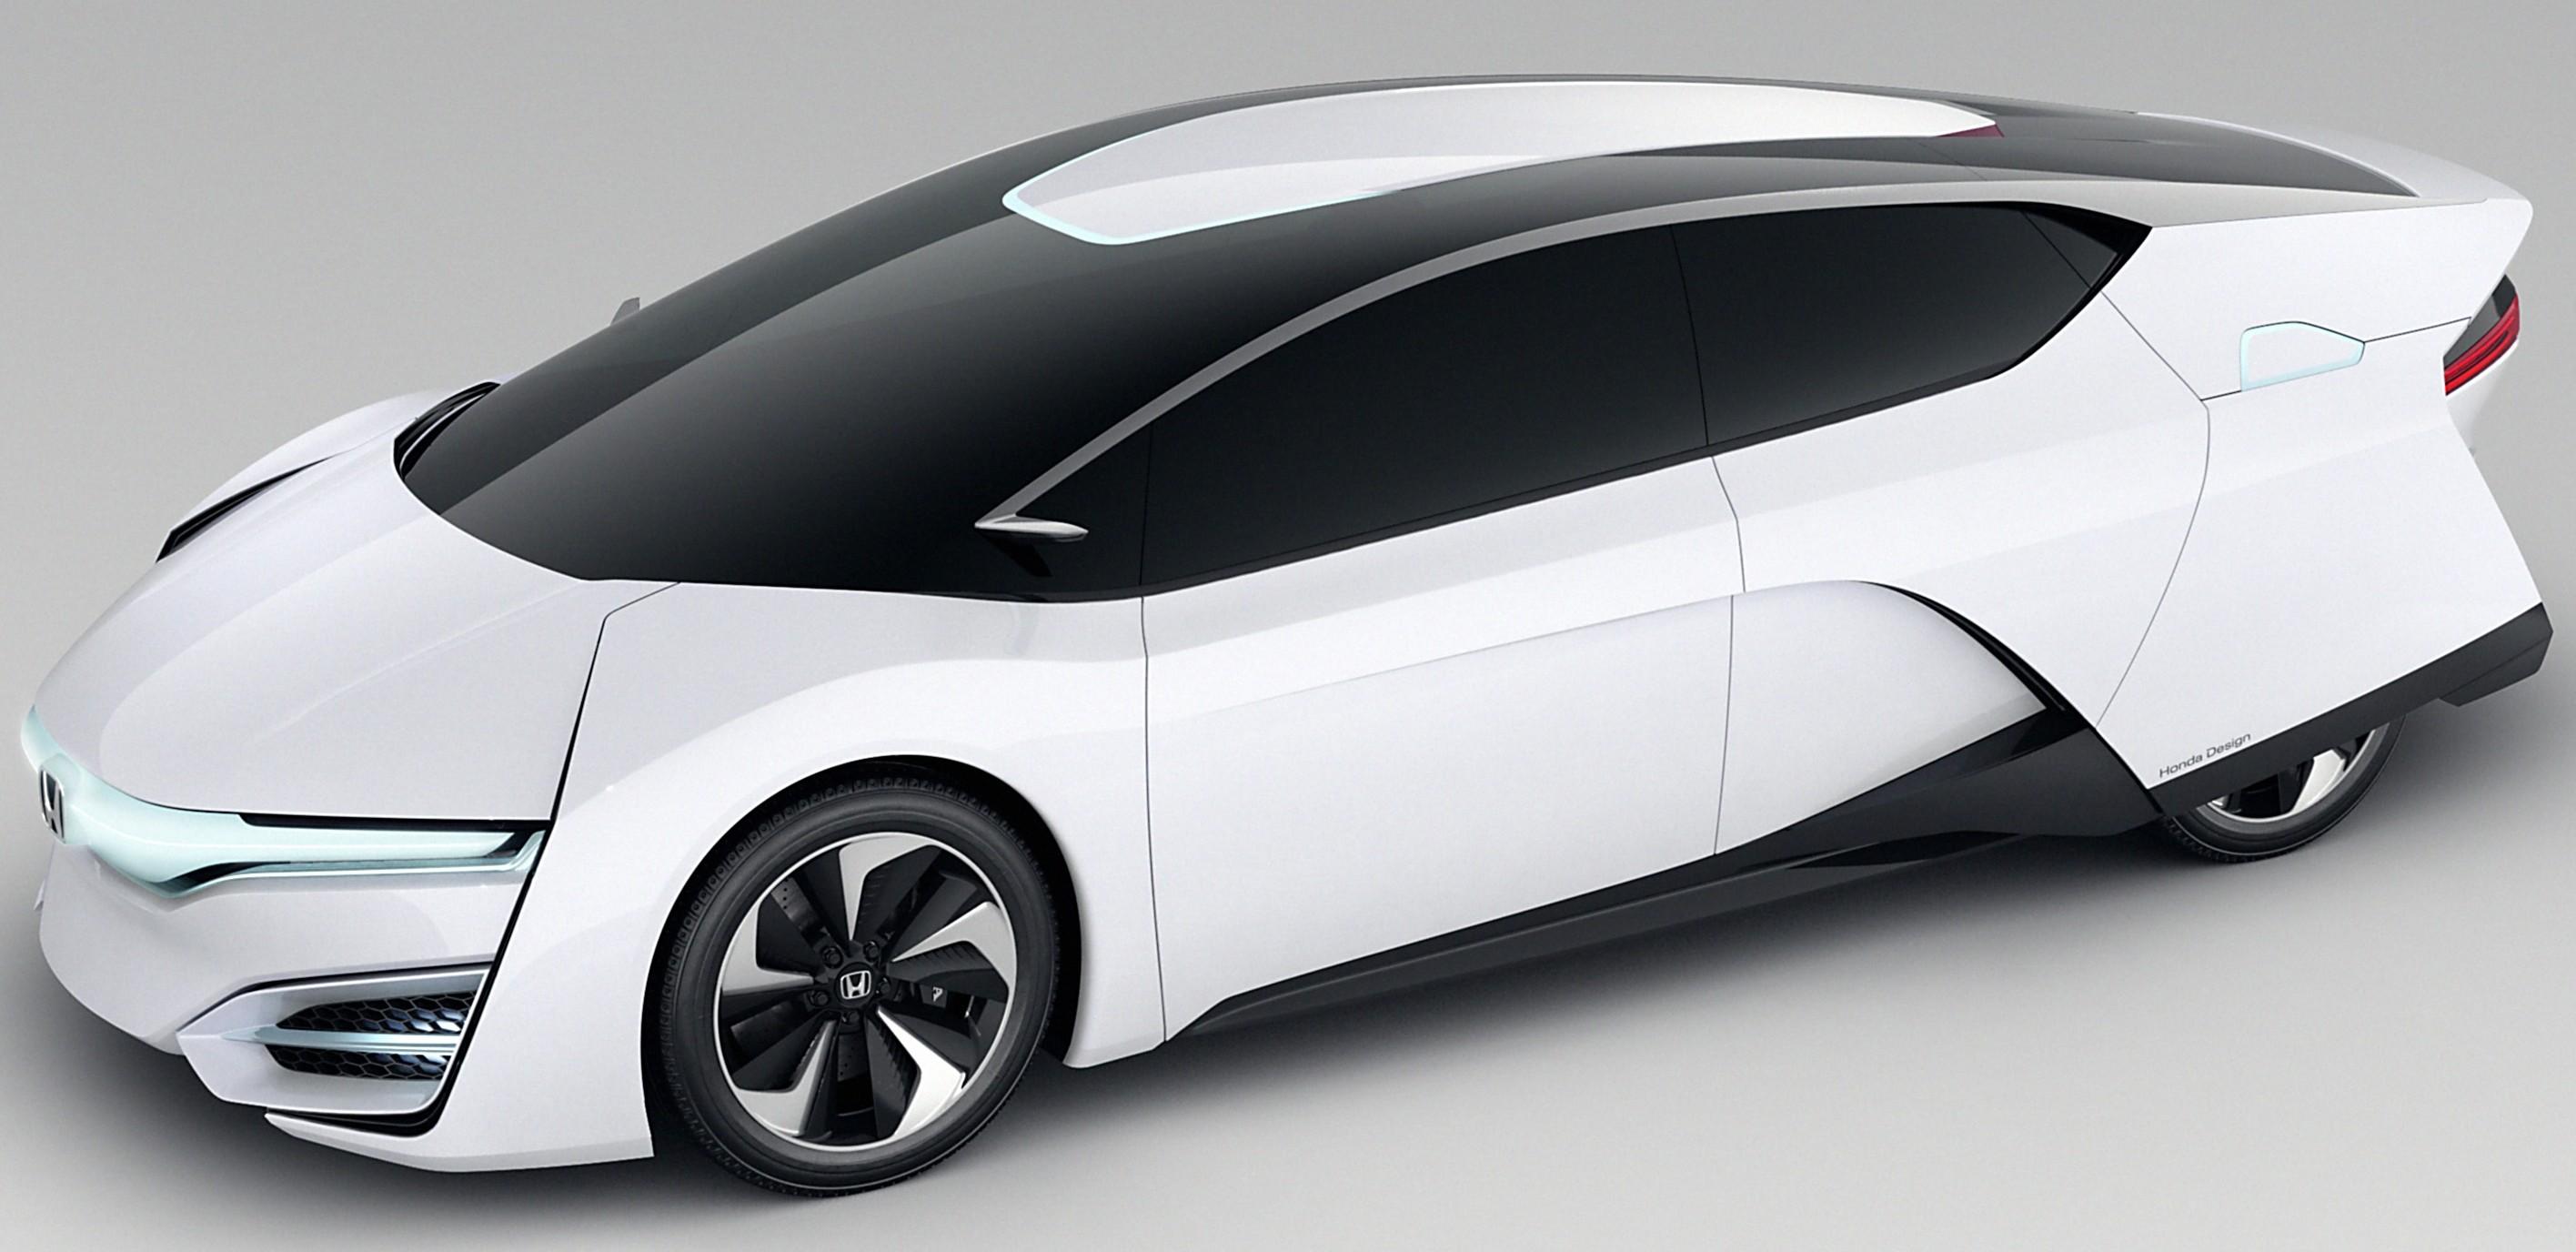 Why hydrogen-powered cars will drive Elon Musk crazy — Quartz